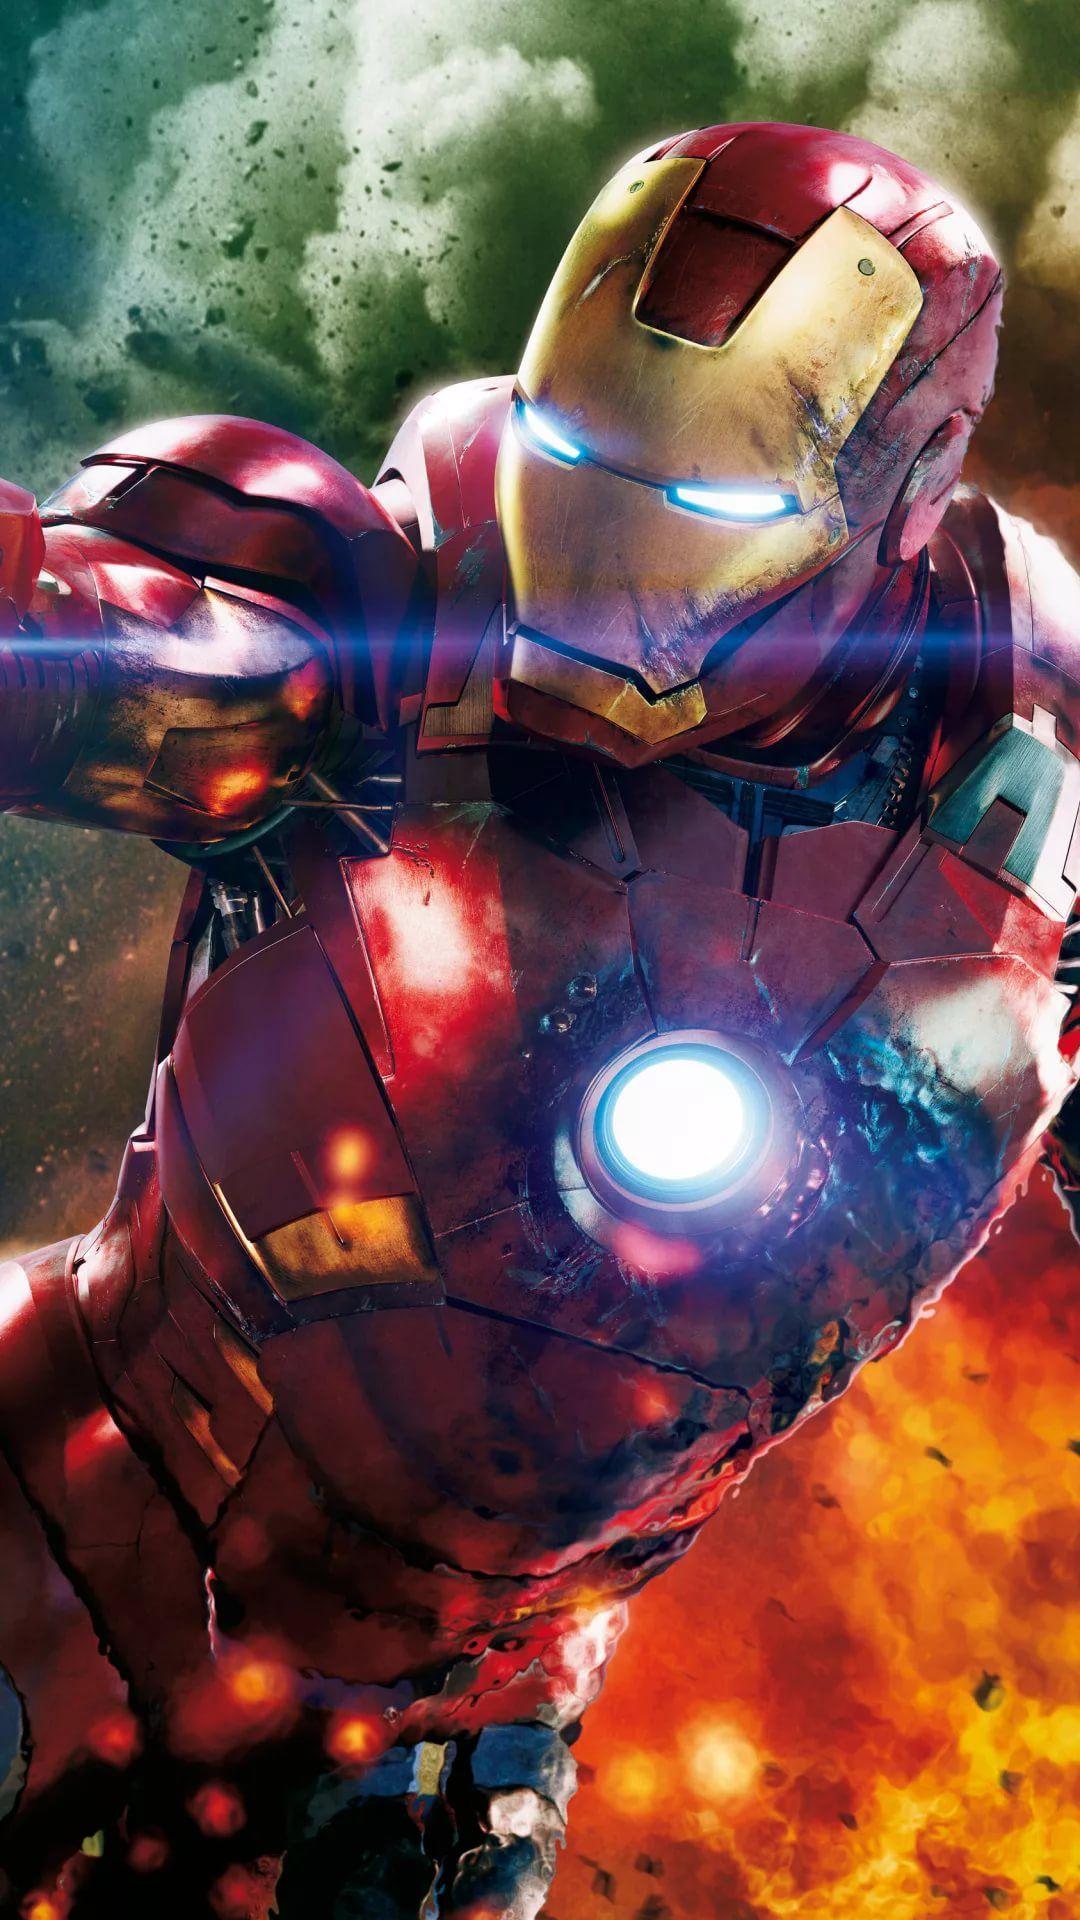 Iron Man D iPhone wallpaper high quality